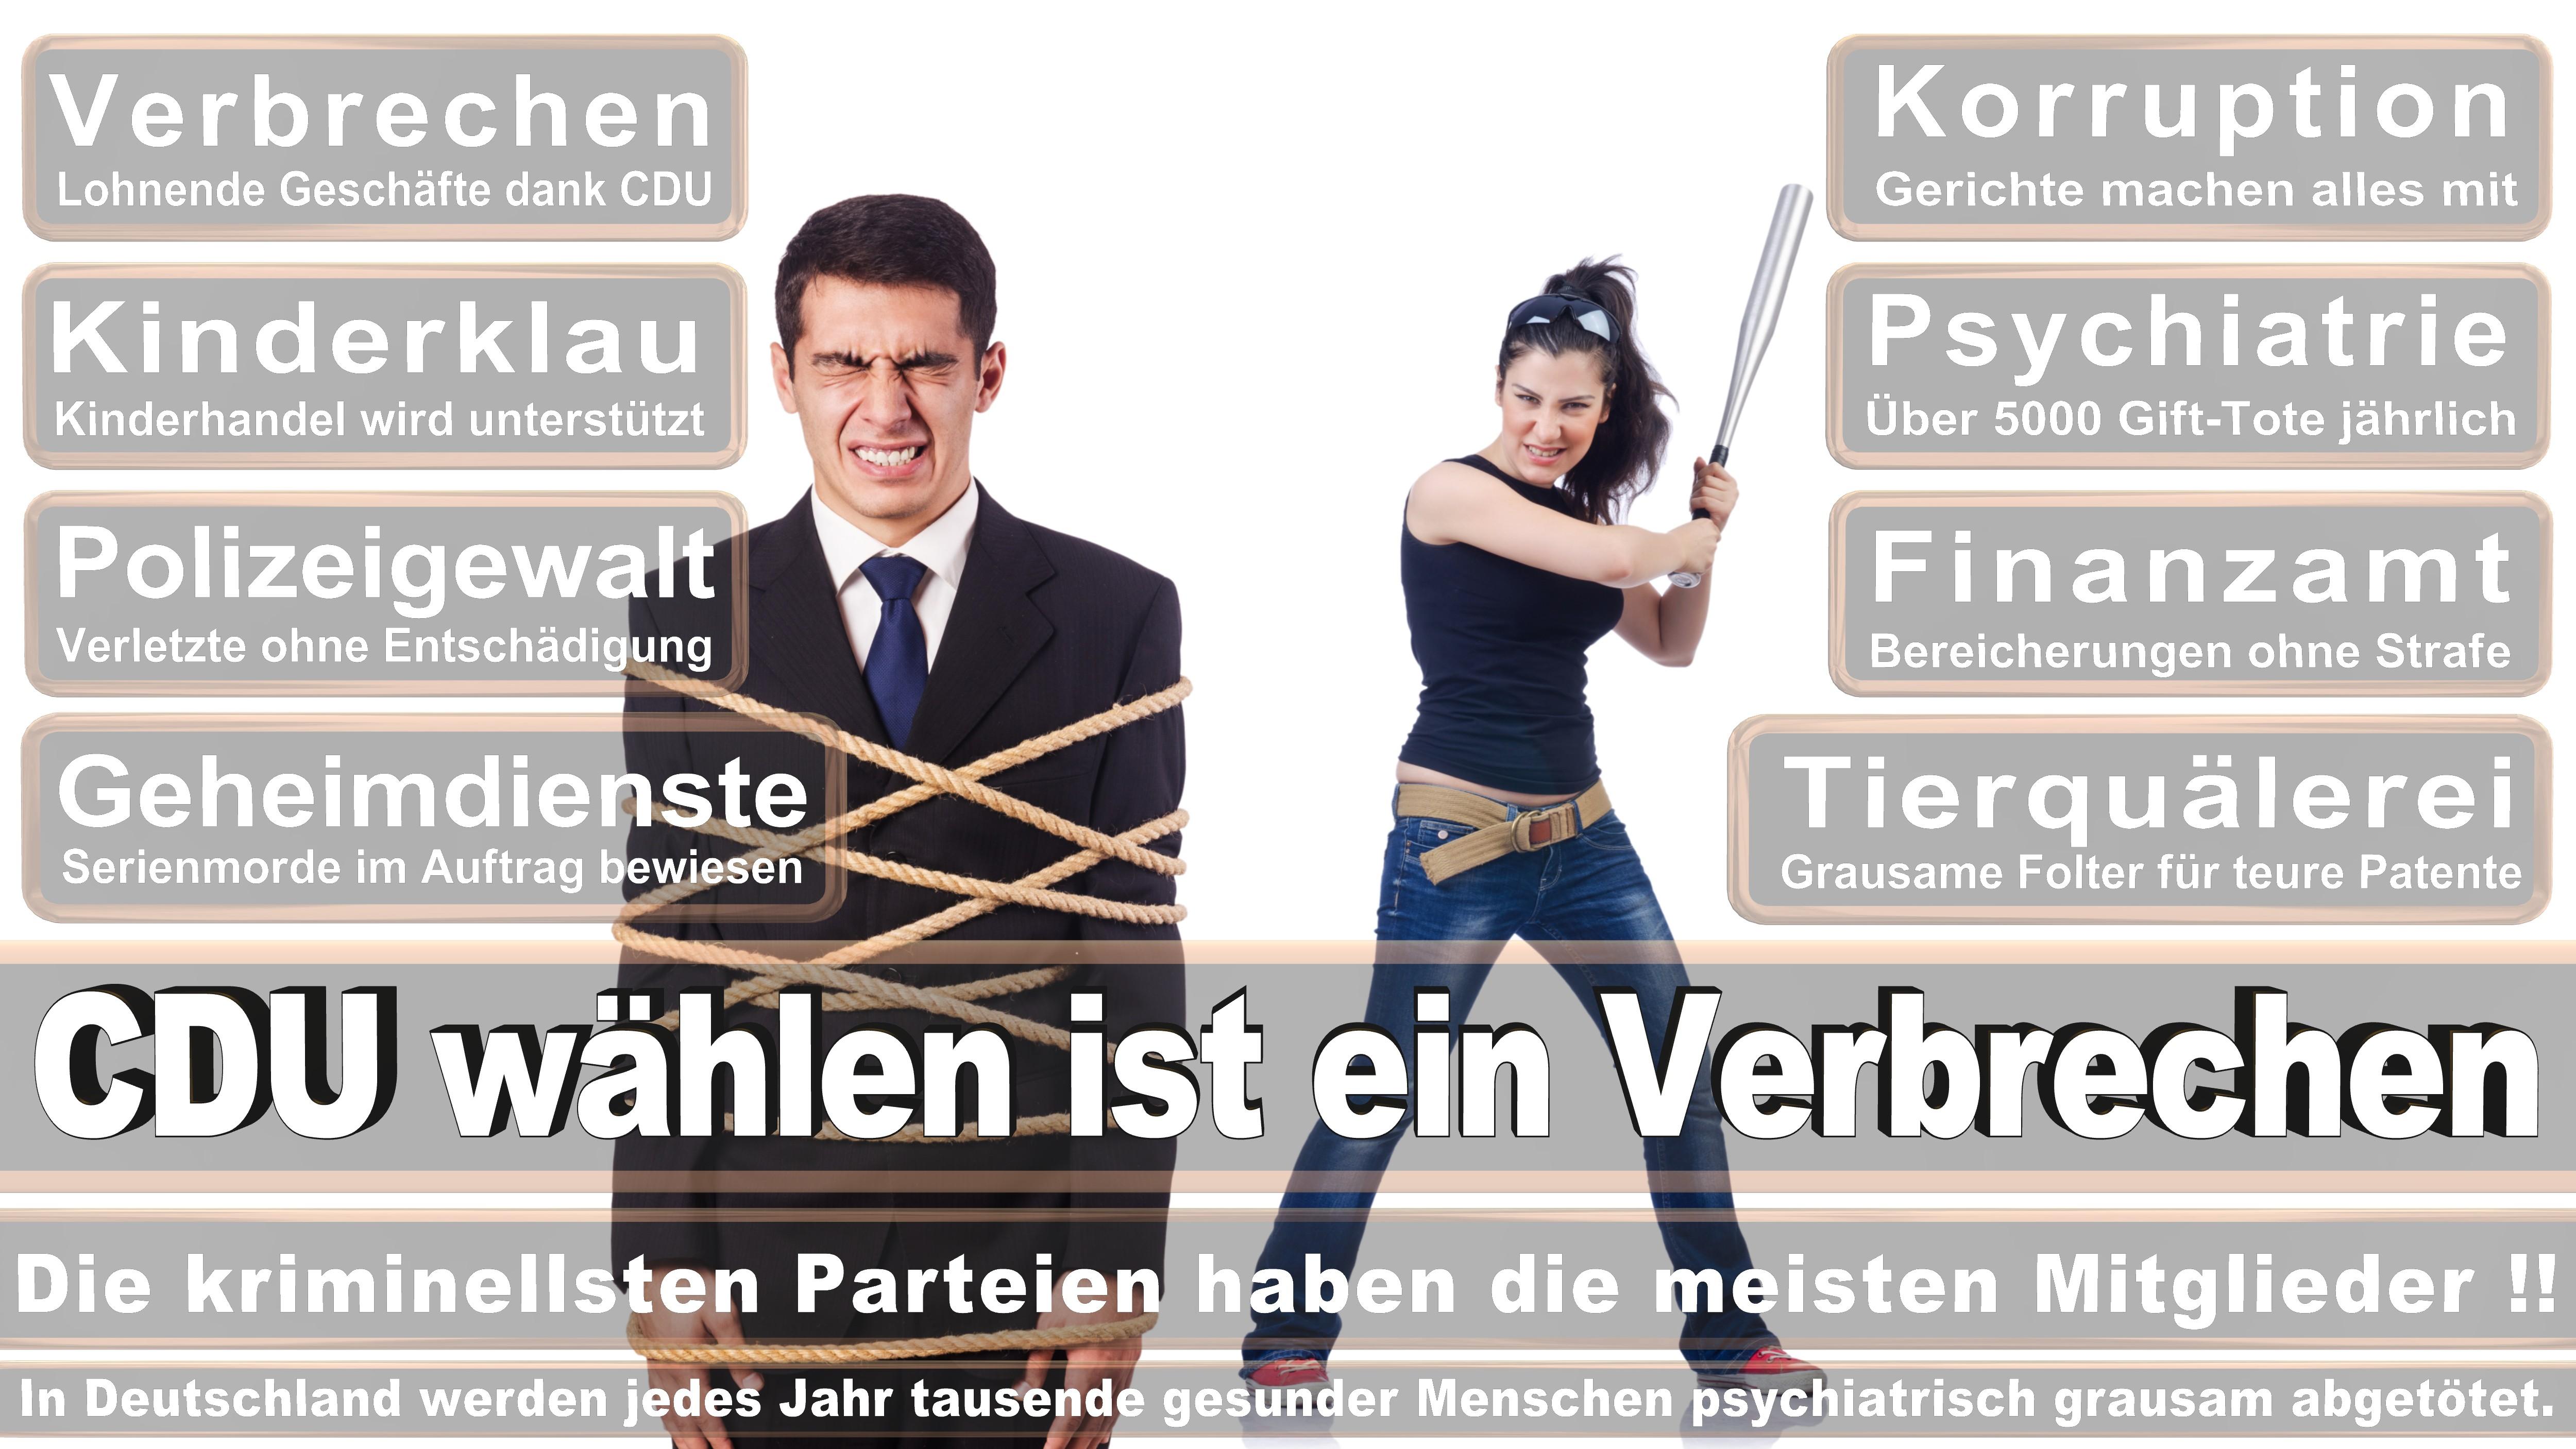 Roderich Kiesewetter CDU CSU Politiker